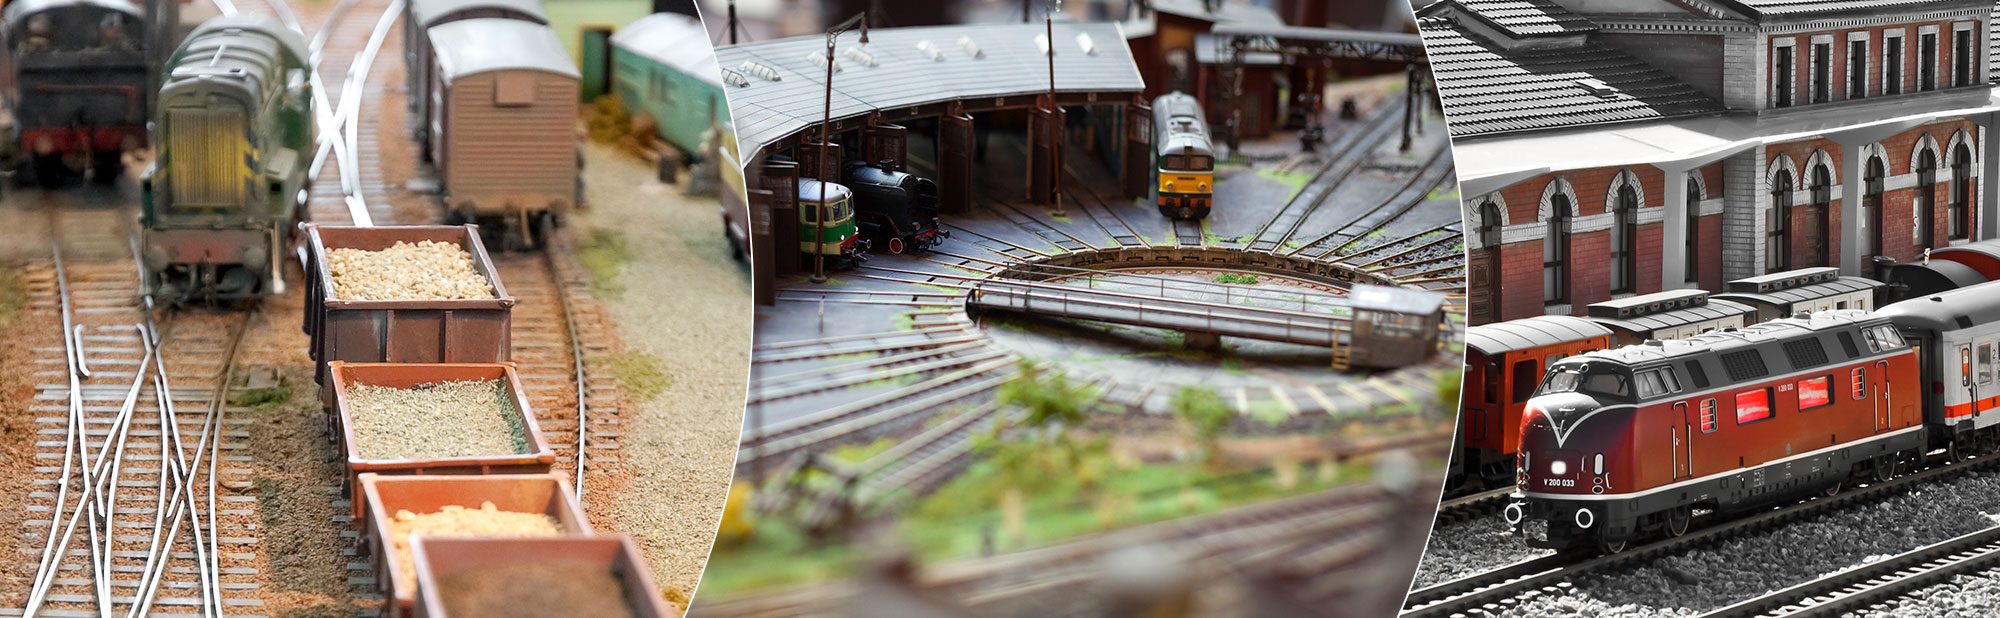 Home Railmodeller Pro Ho Railroad Wiring Diagrams